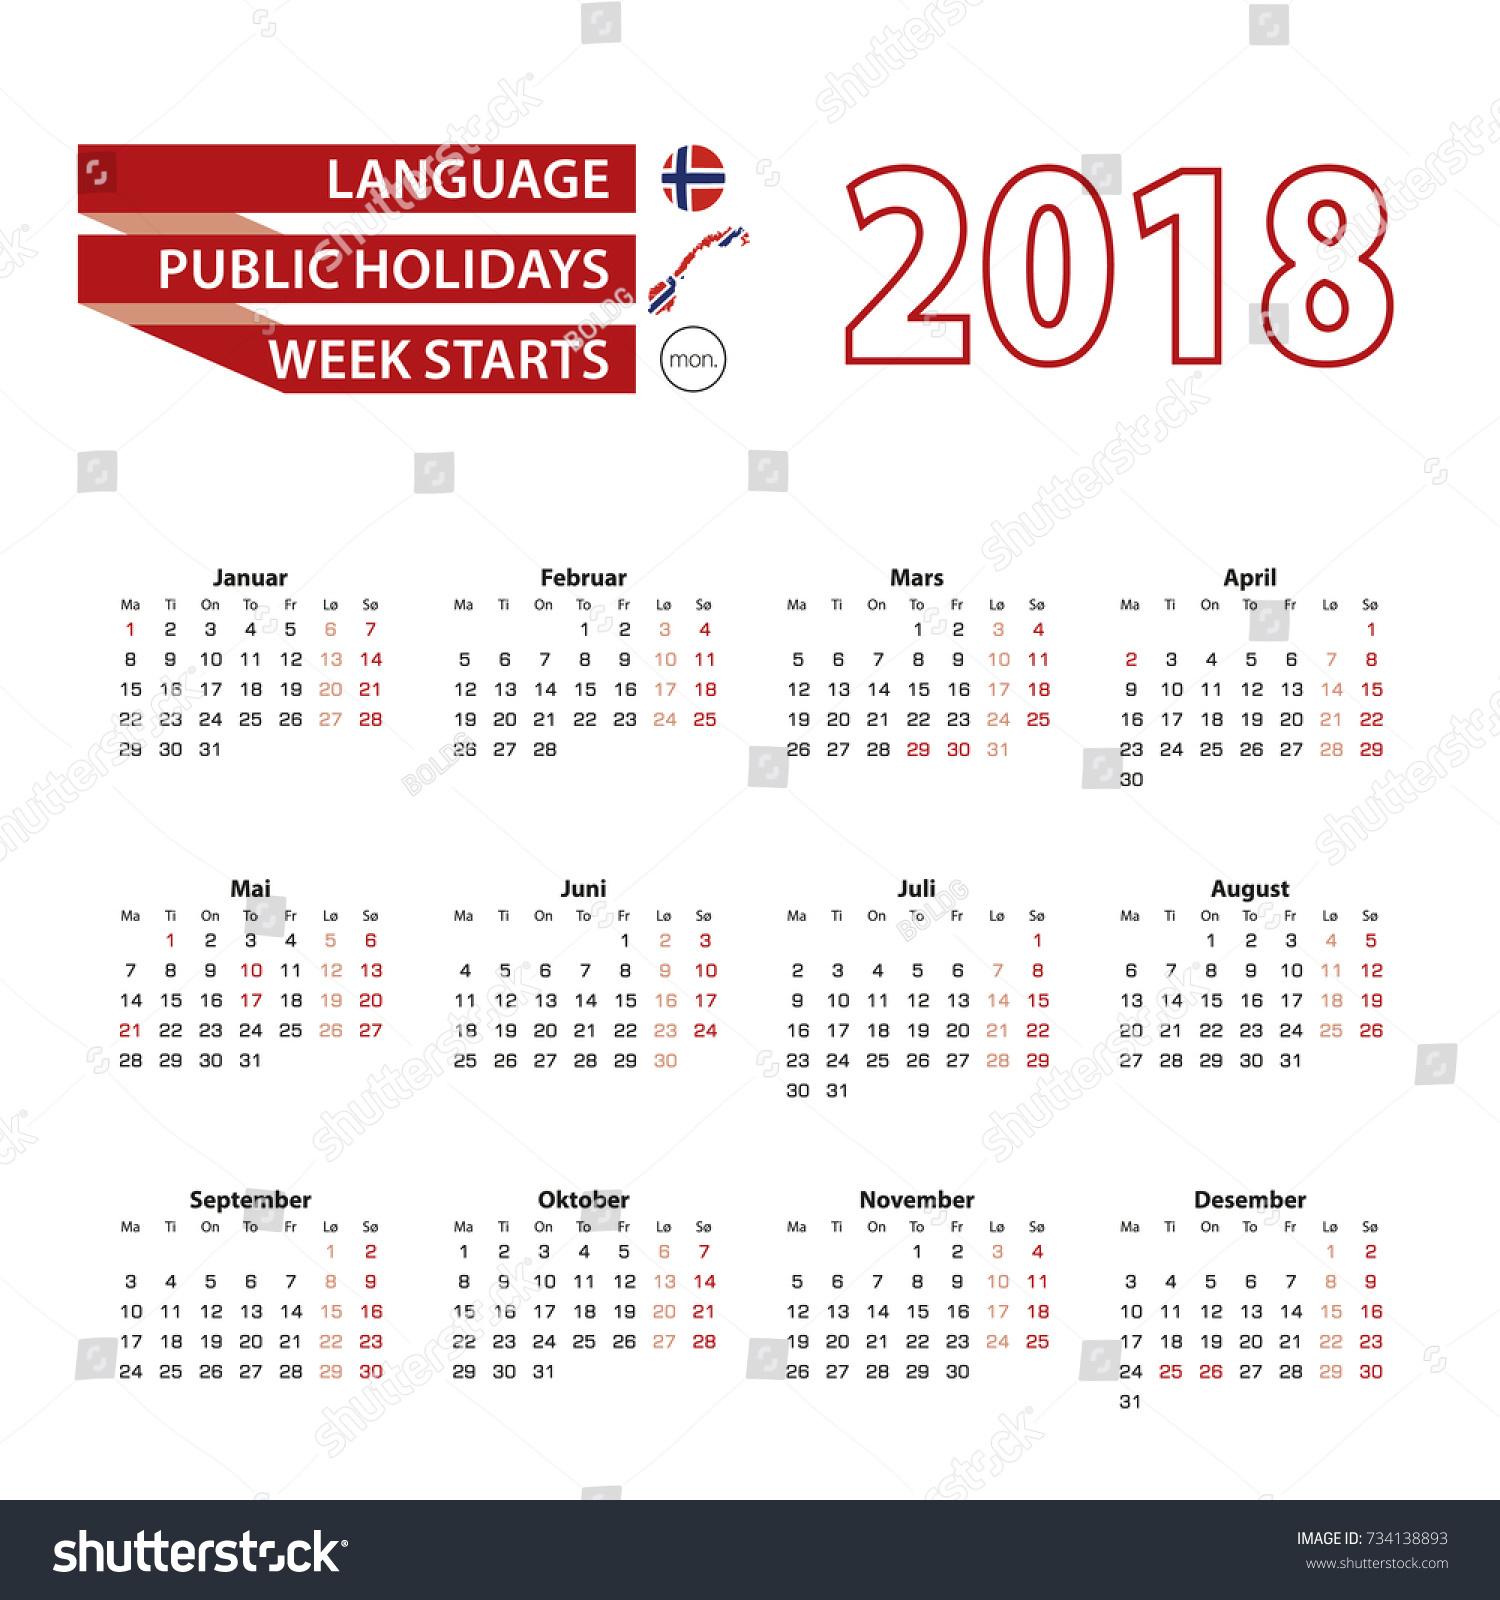 Calendar Norway : Calendar norwegian language public holidays stock